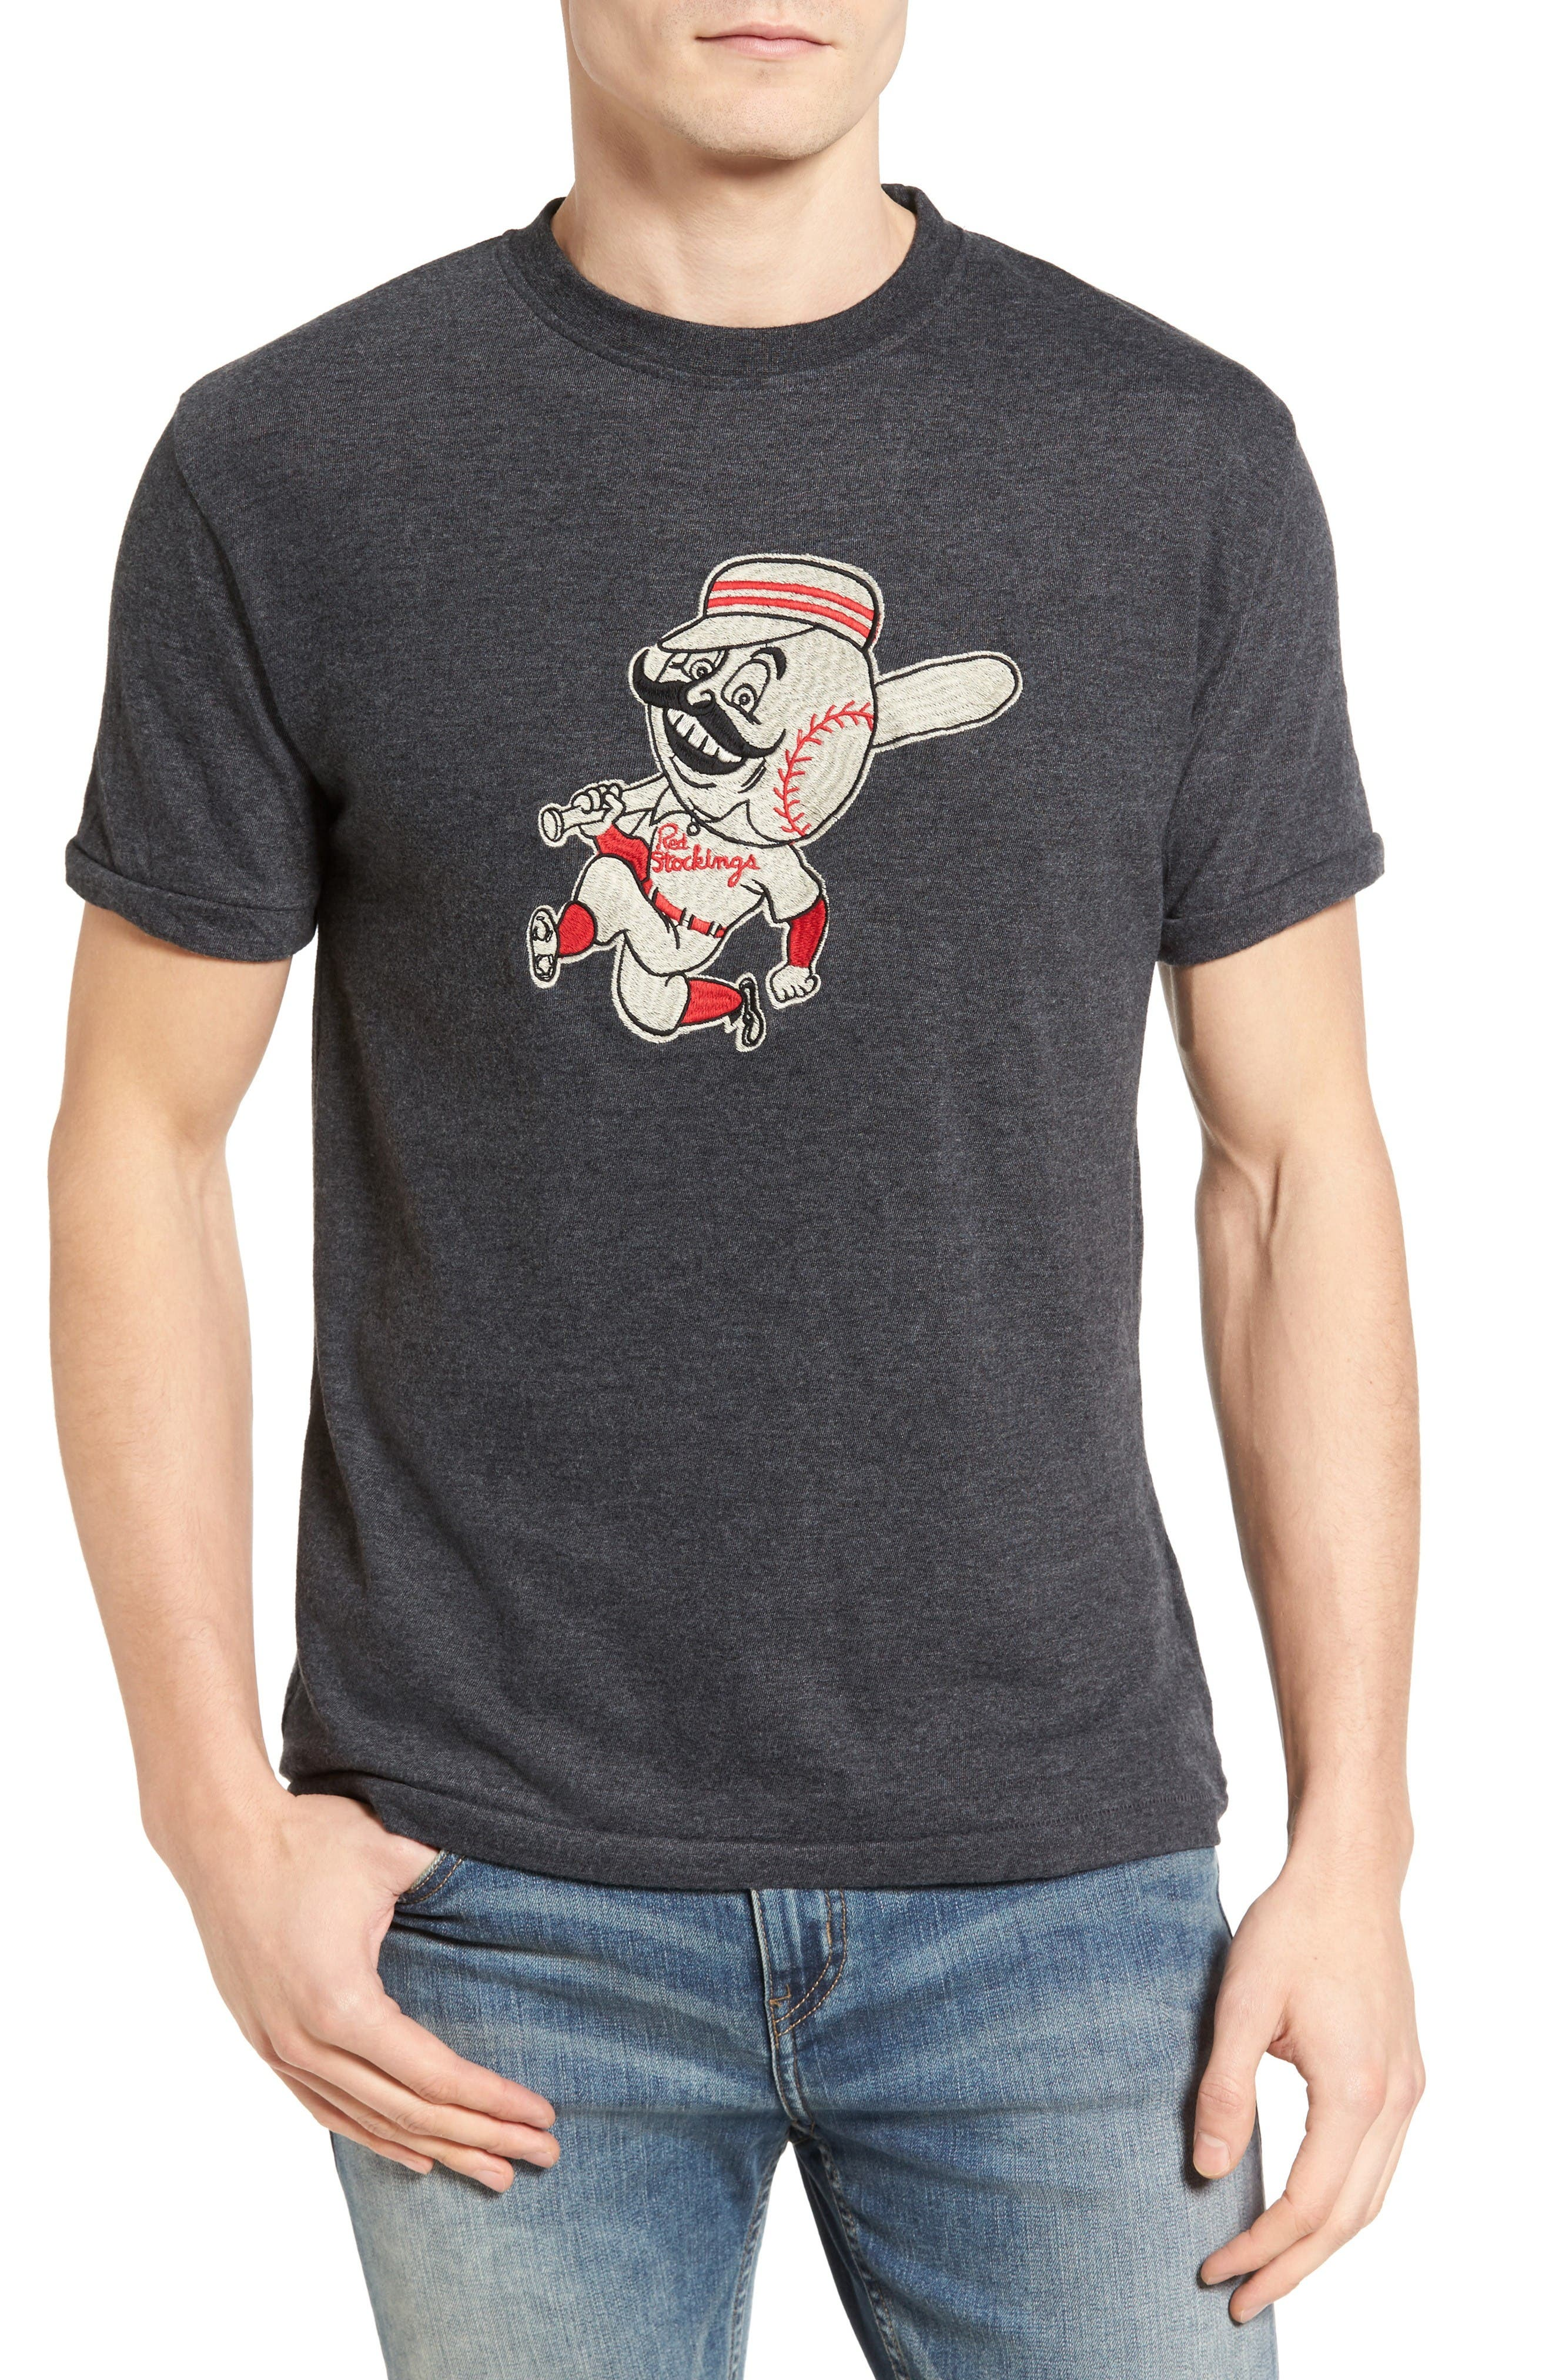 Main Image - American Needle Hillwood Cincinnati Reds T-Shirt